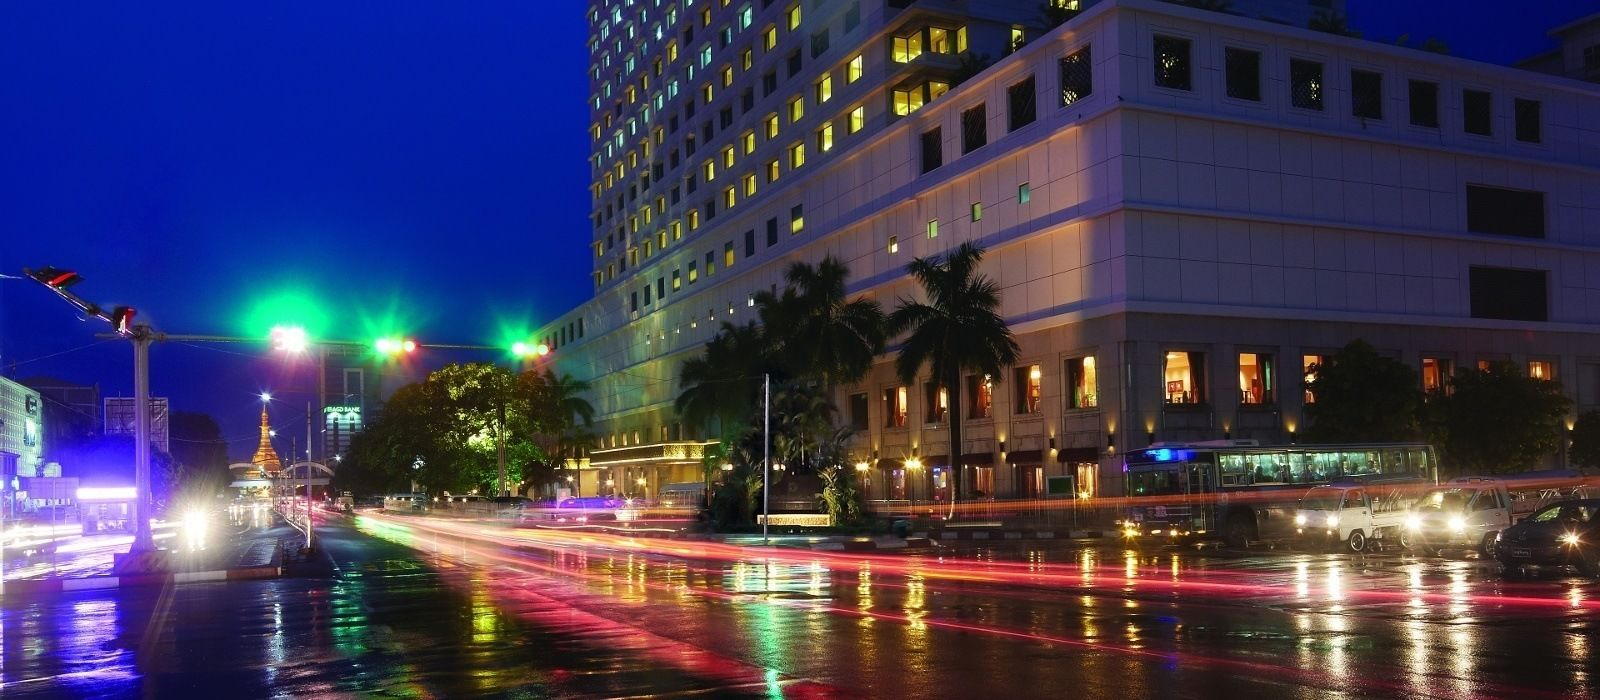 Hotel Sule Shangri La (Yangon) Myanmar